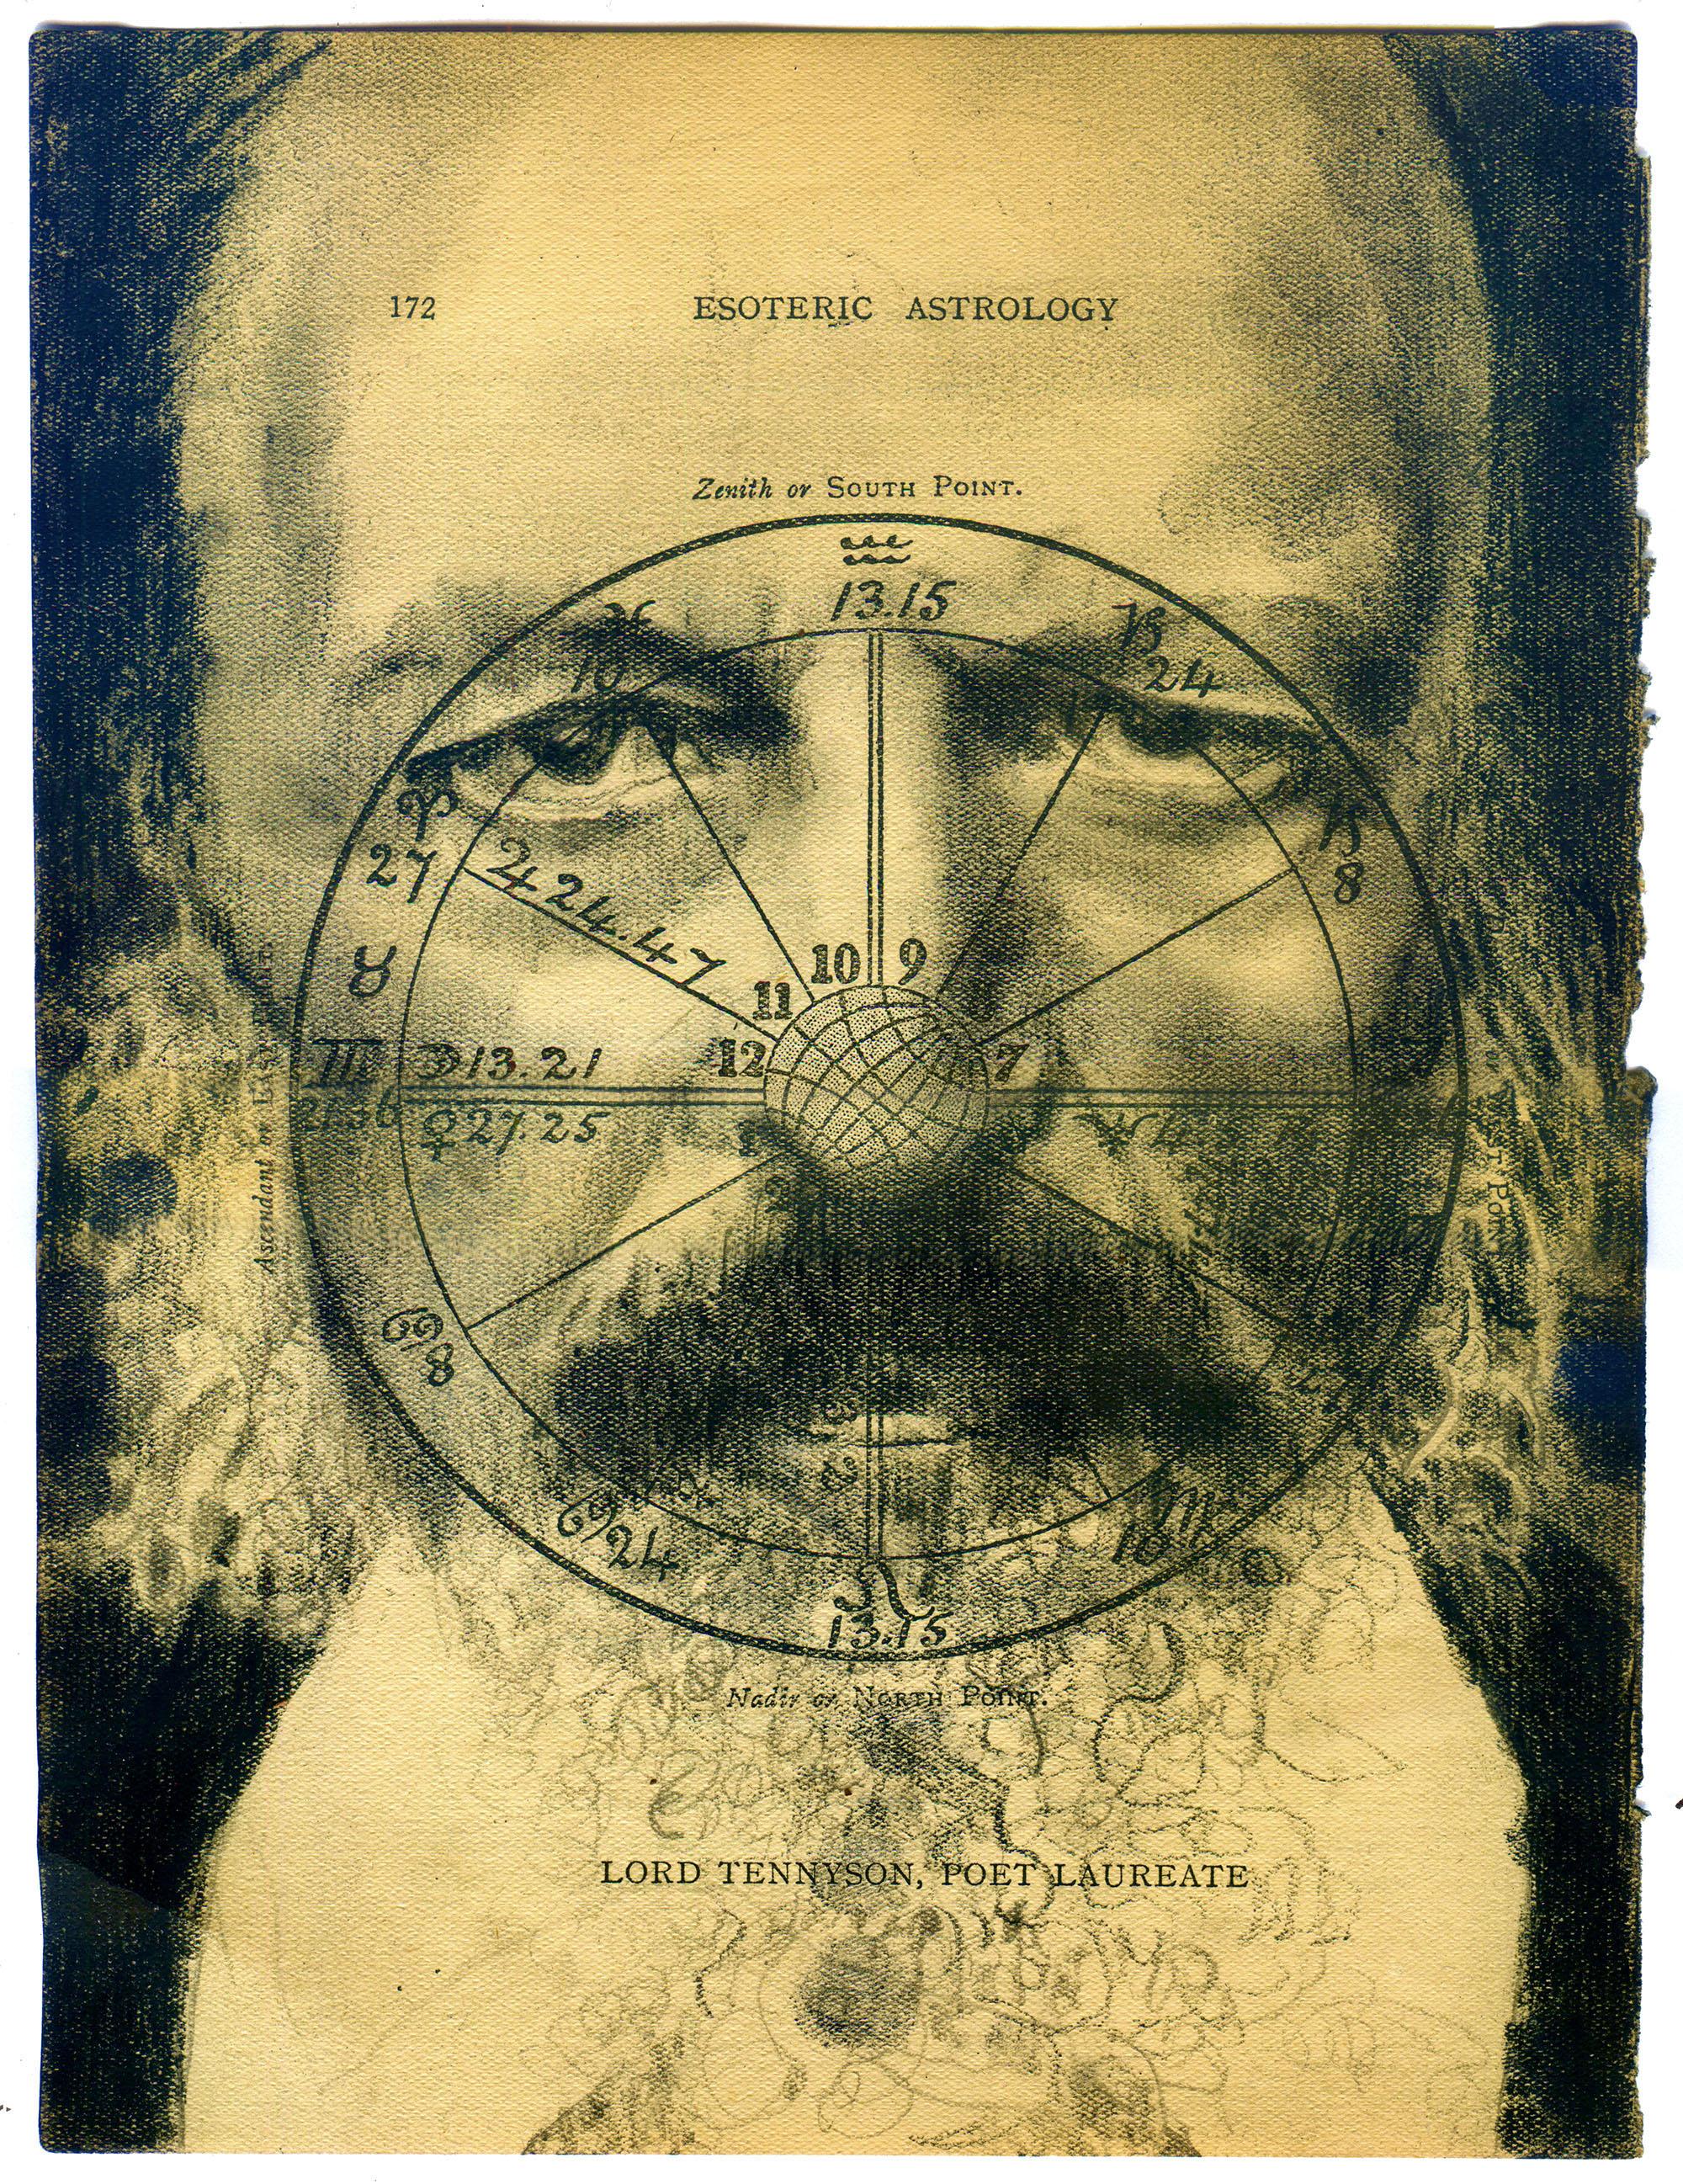 Copyright Daniel Baxter Lord Tennyson Portrait.jpg